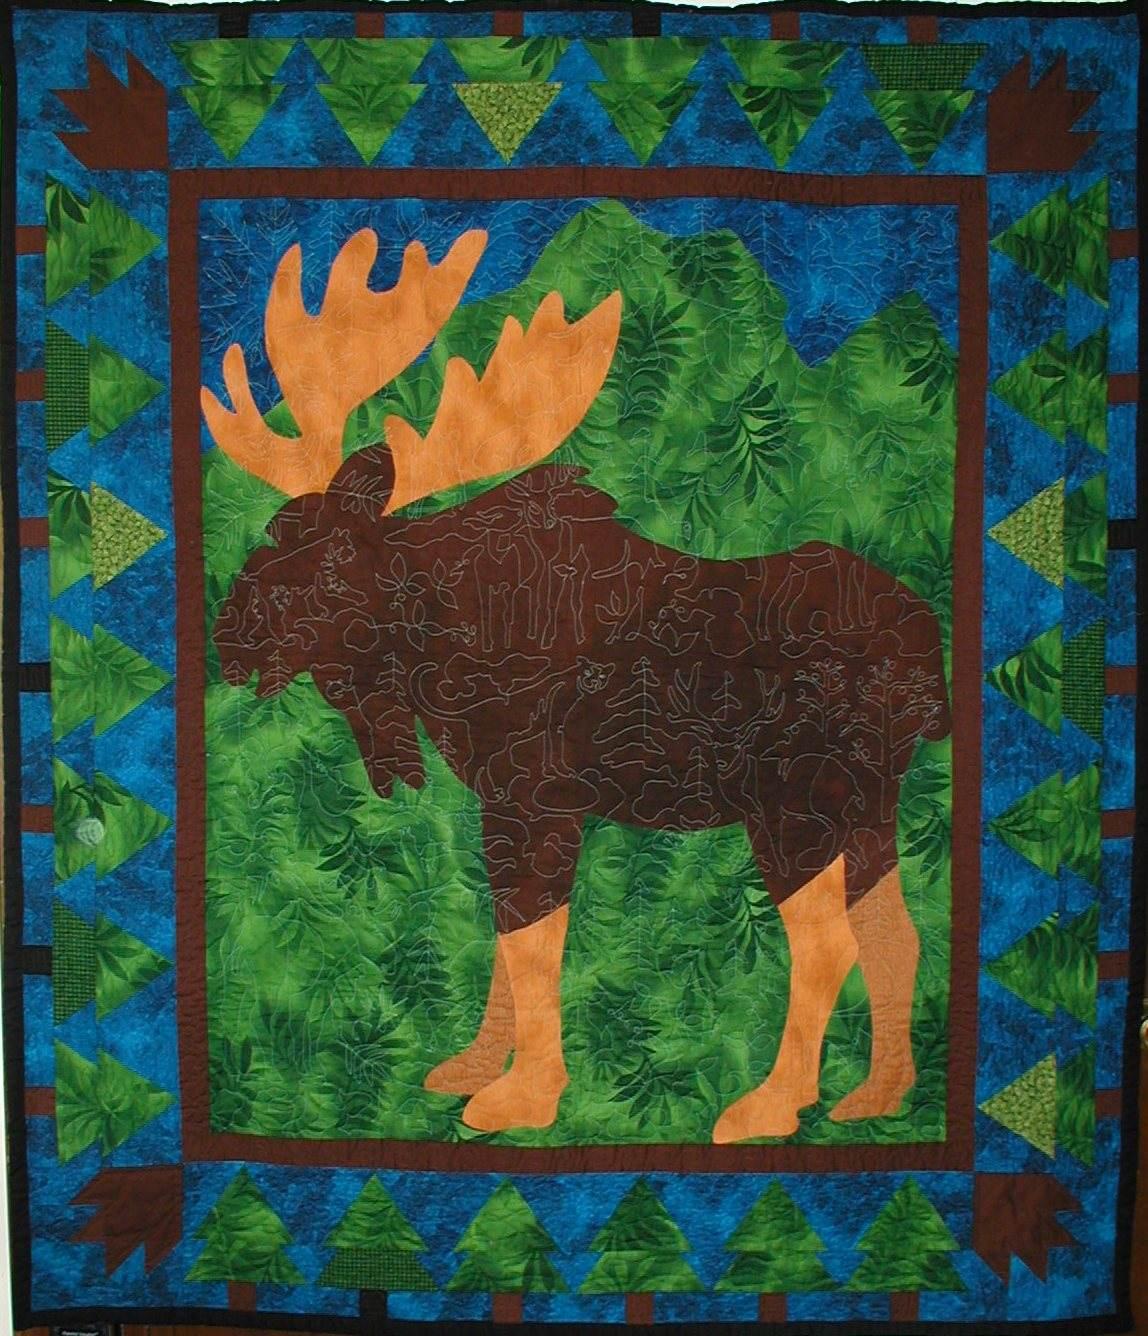 Moose Quilt Pattern | MeadowLyon Designs : moose quilt - Adamdwight.com